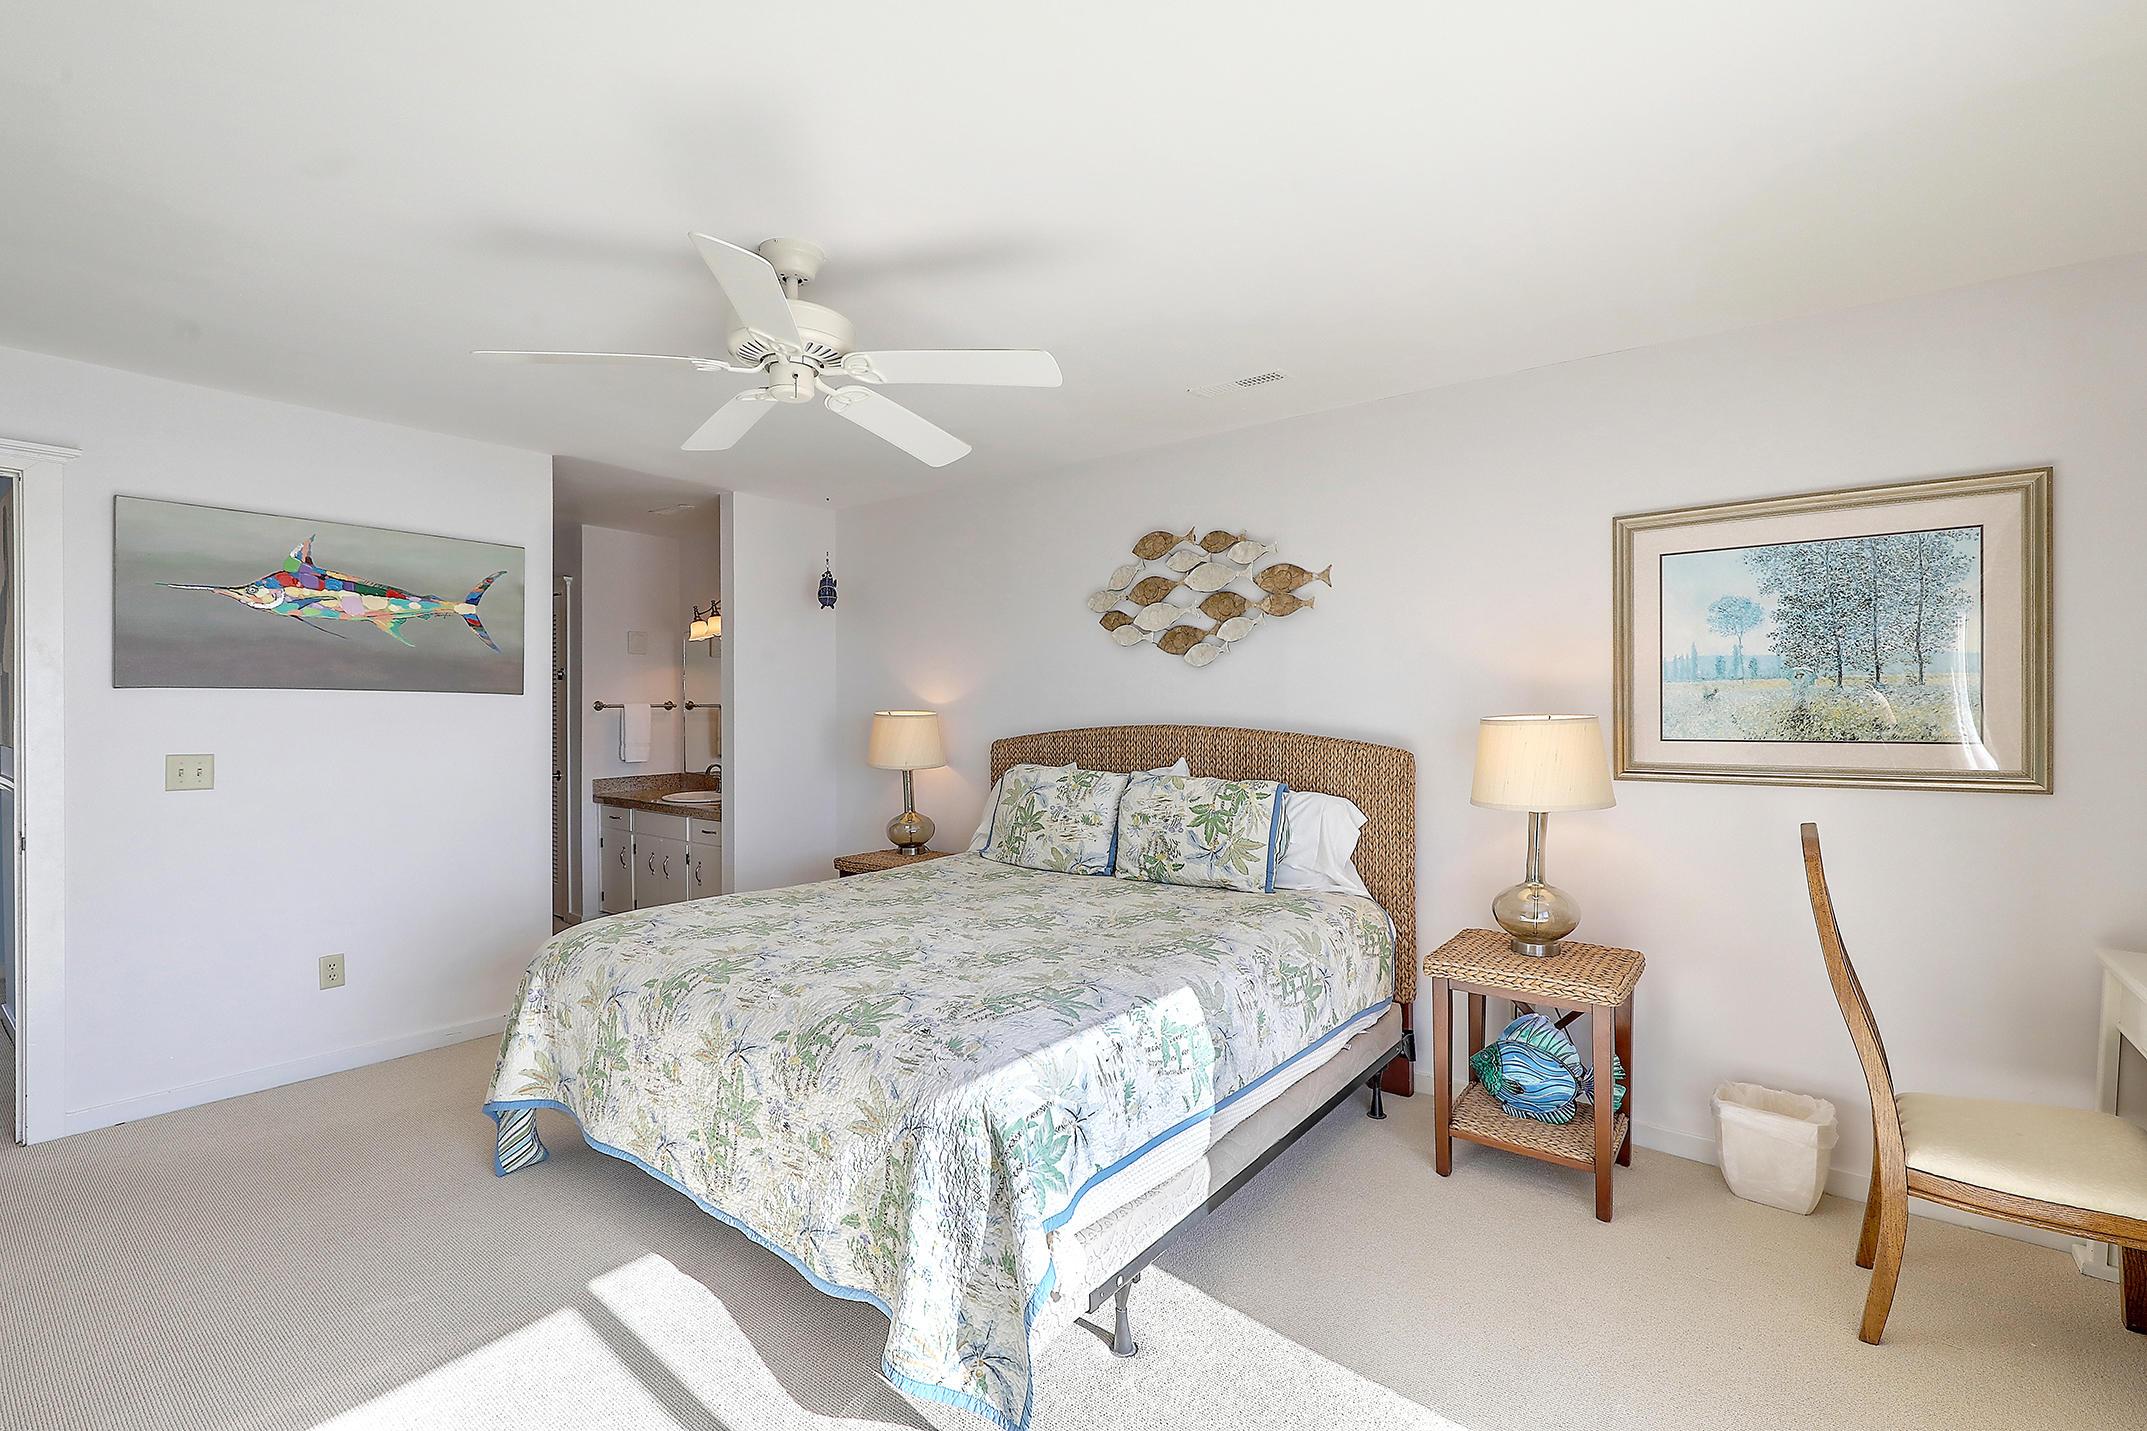 Wild Dunes Homes For Sale - 14 Beachwood East, Isle of Palms, SC - 33